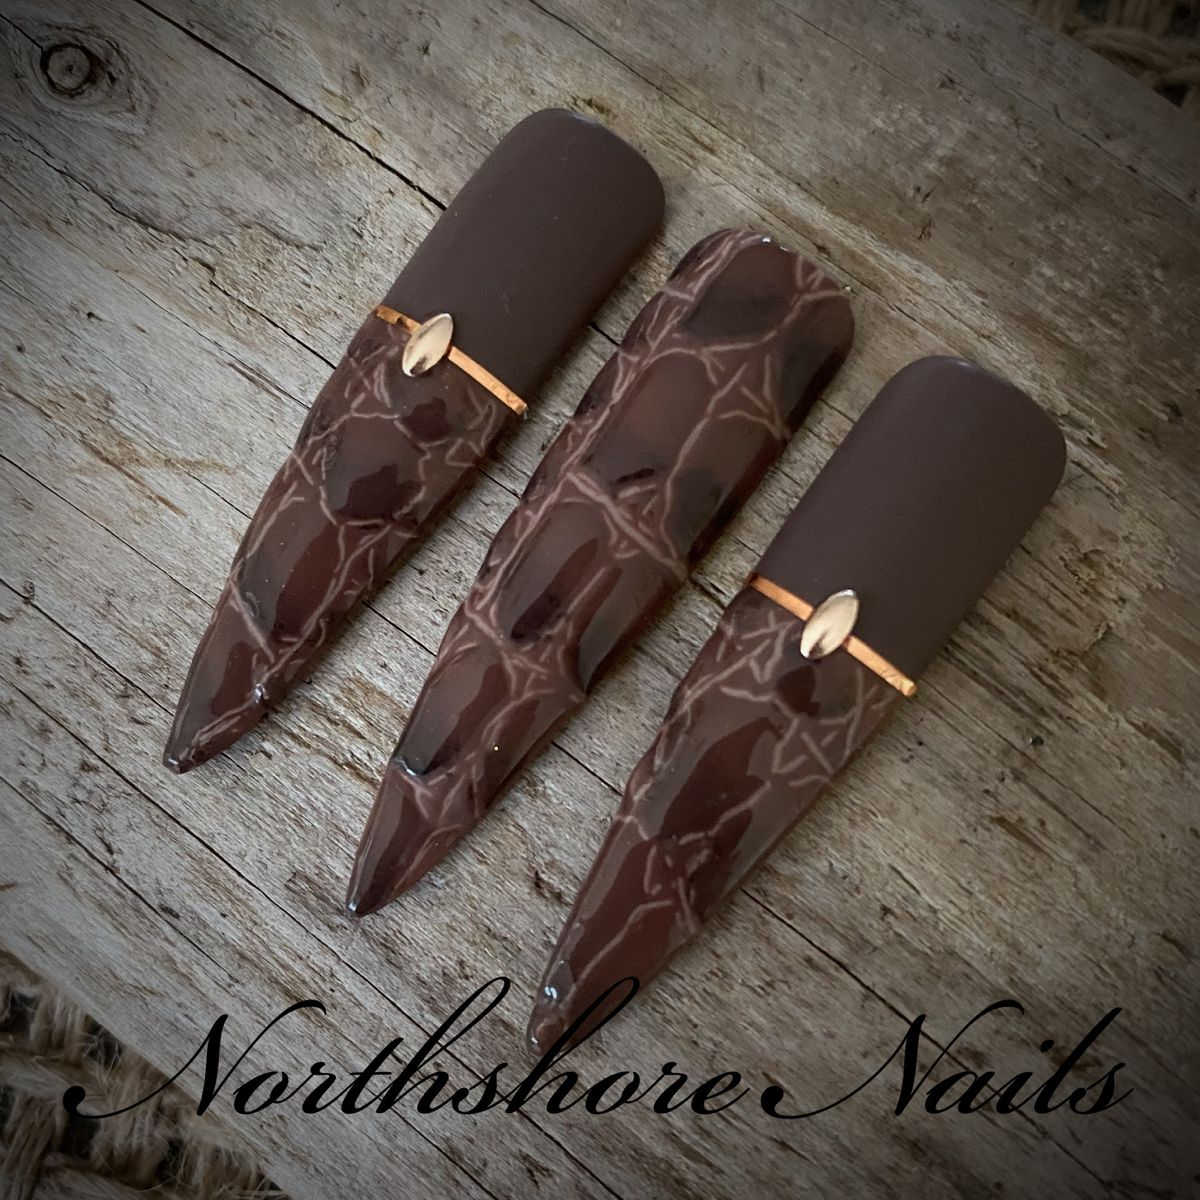 In a while...crocodile! Absolutely in L🤎VE with this new technique! Part 2! Thank you again for the awesome class @classicmully • Using the best @uglyducklingproducts • • #crocodileskin #artisticnails #crocodilenails #nailartaddict #uniquenails #fashionnails #handpaintednailart #Nailart #brownnails #notd #fashion #instanails #neutralnails #leathernails #nailtrends #gelnailartist #nailsoftheday #nailartdesigns #handbag #fashionweek #okanagannails #gelnails #customnails #texturednails #stilettona